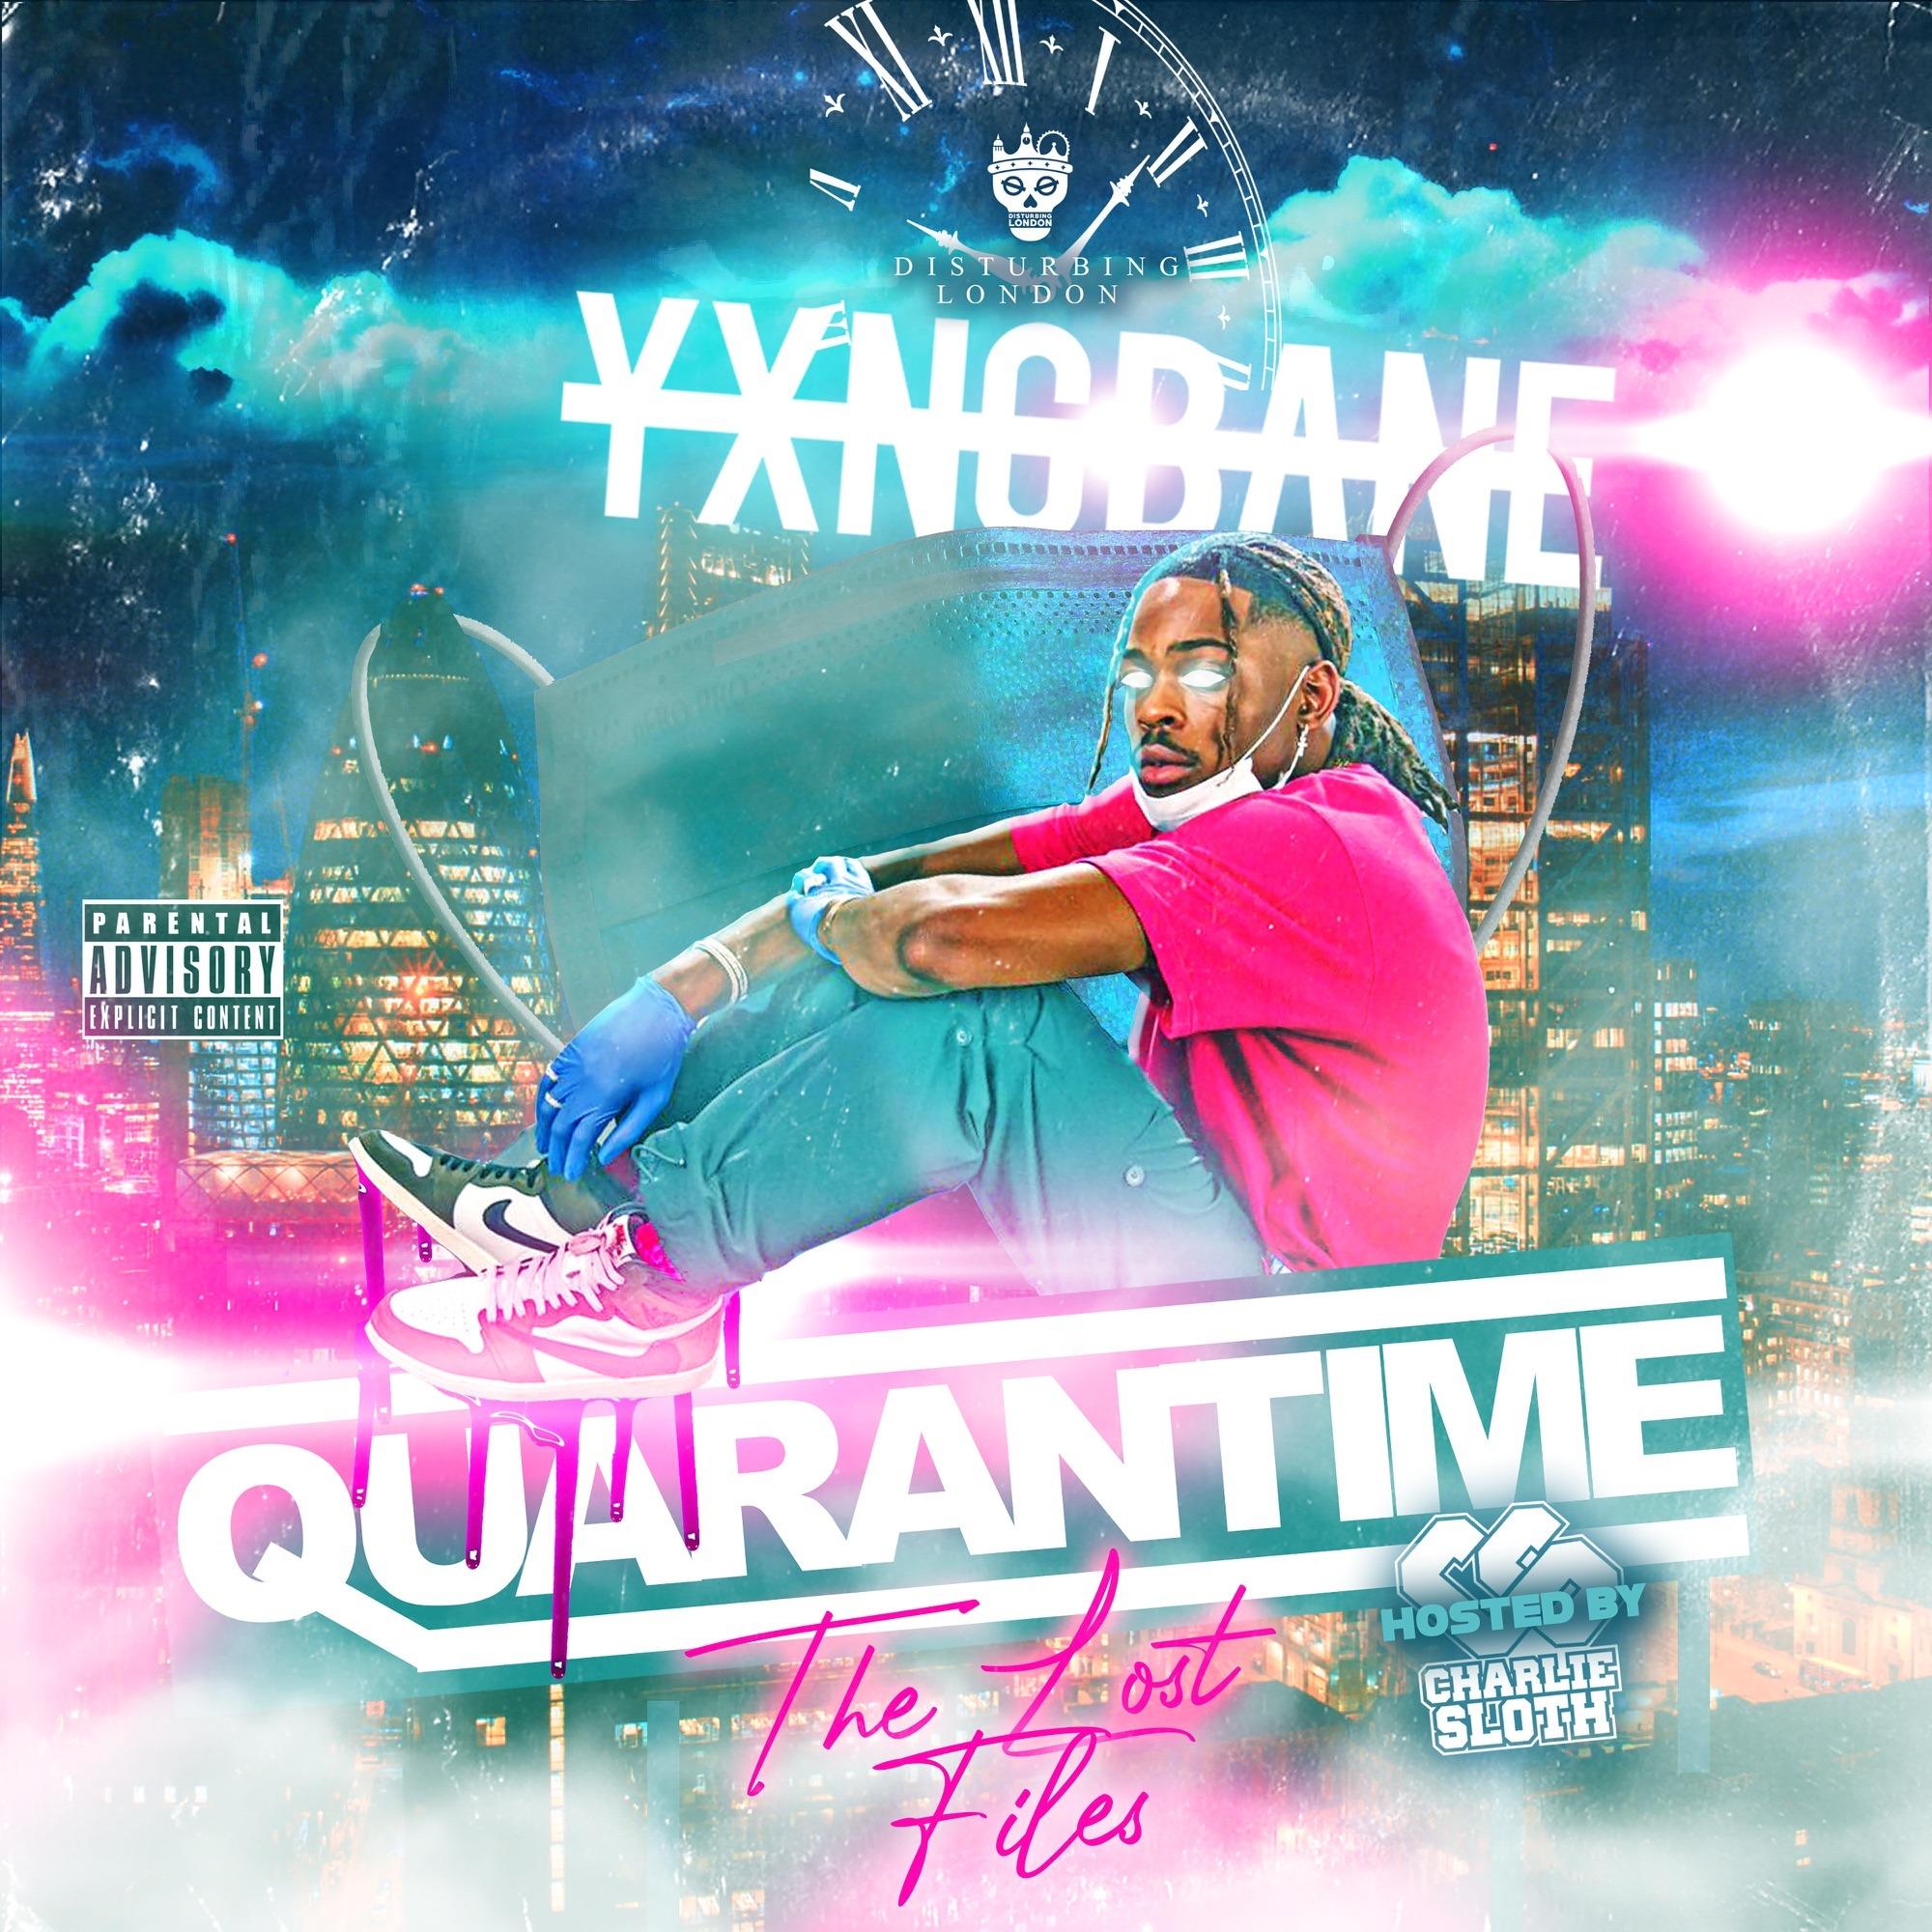 Yxng Bane - Quarantime: The Lost Files